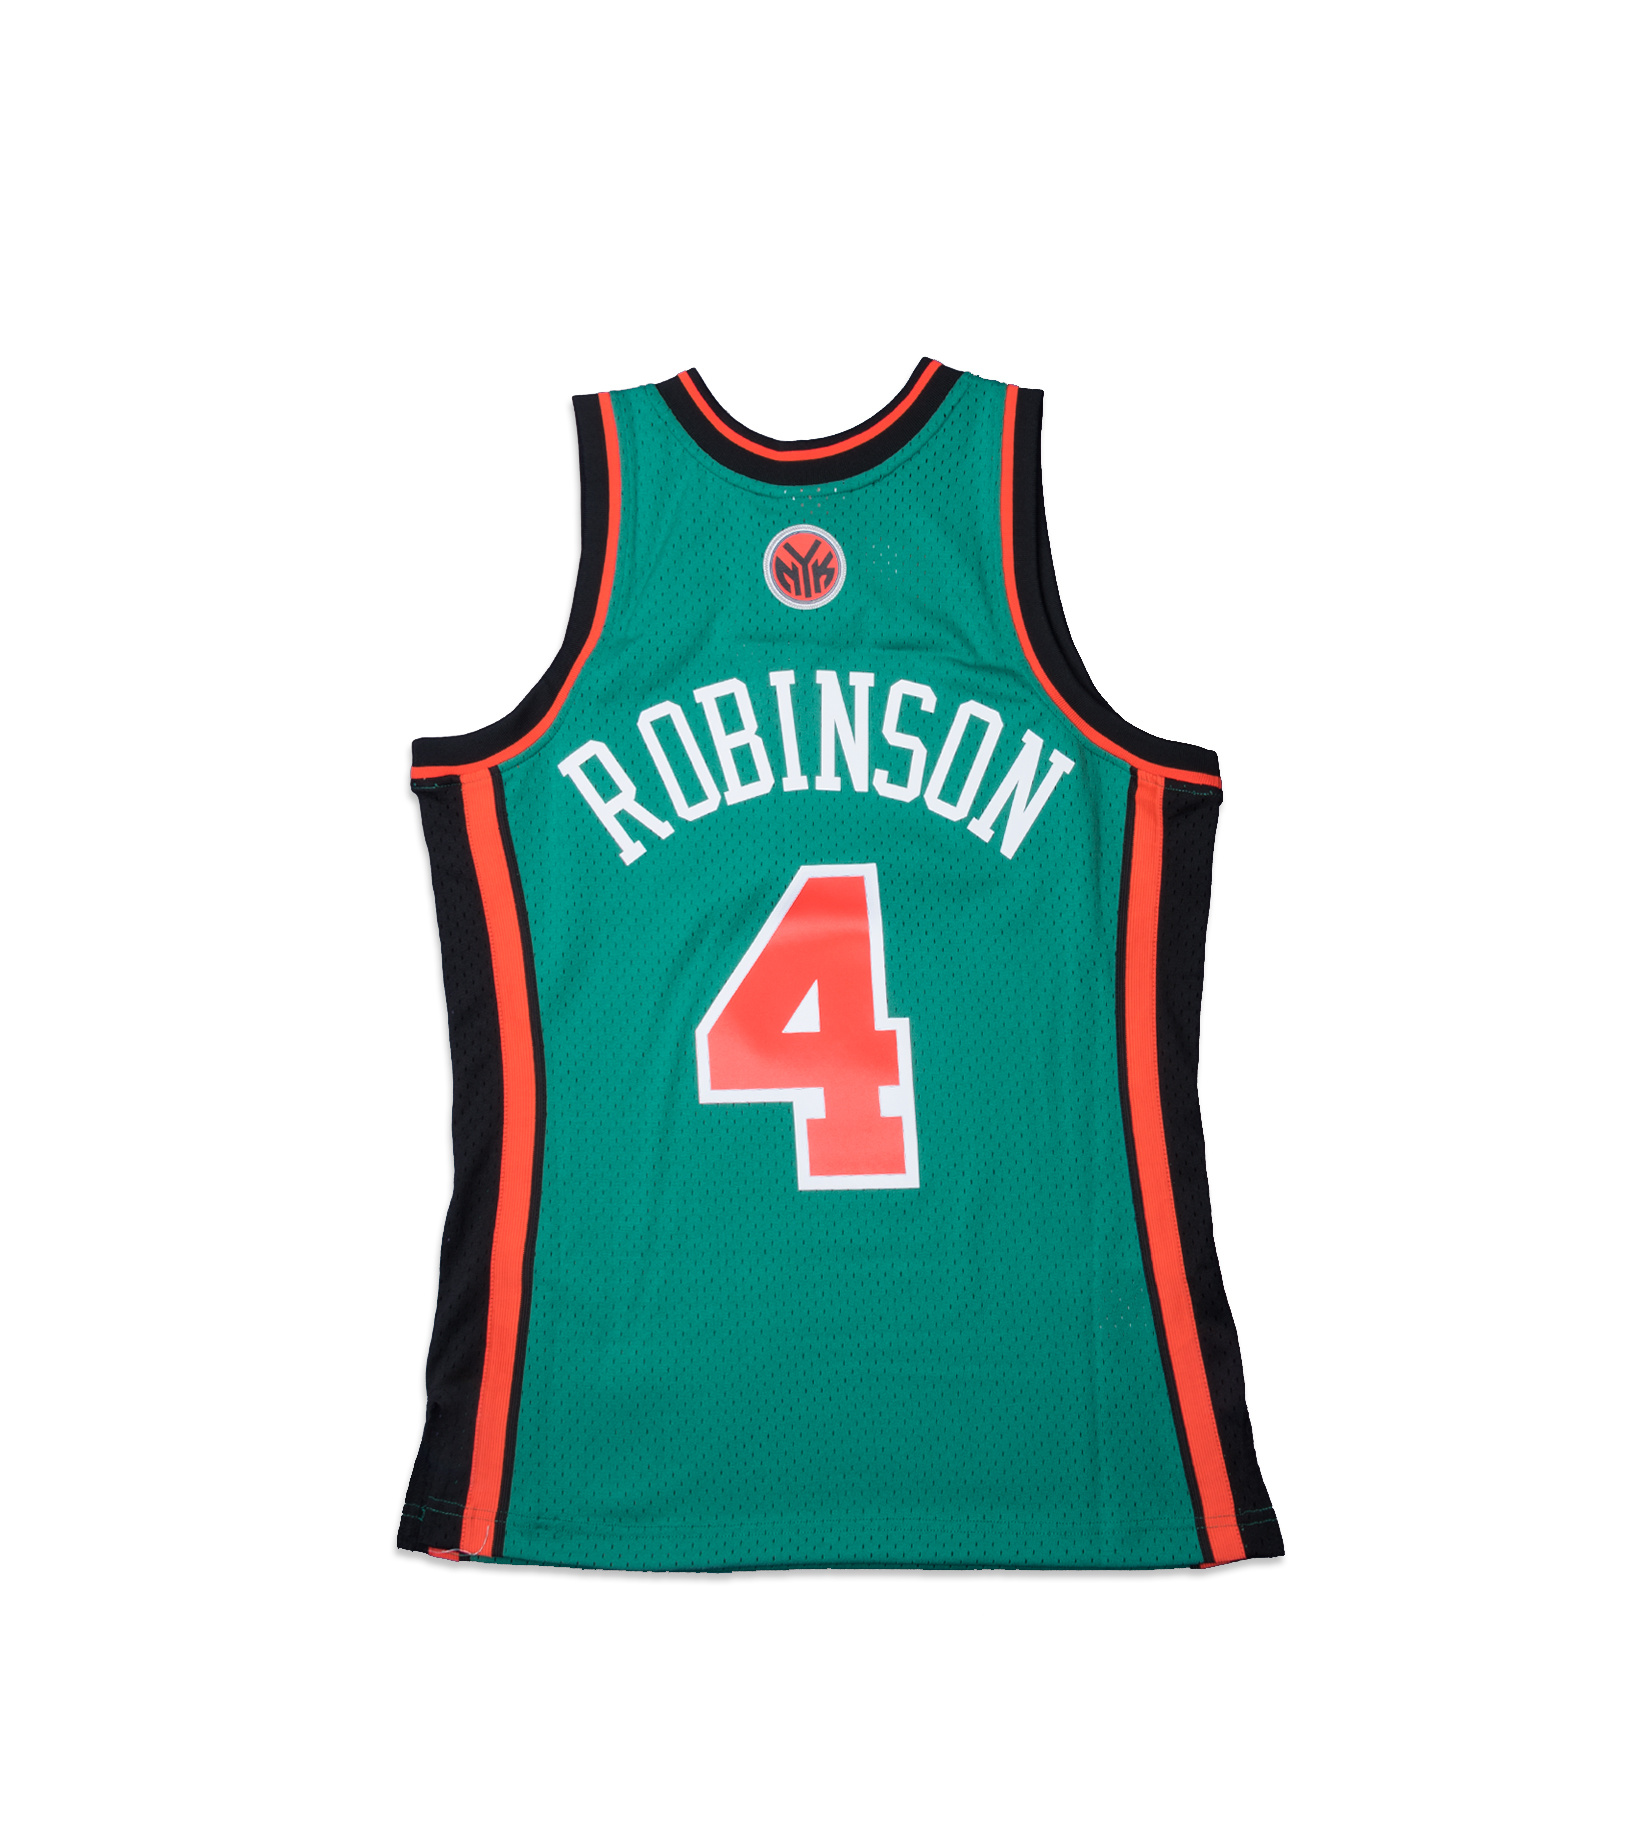 "NY Knicks '06-'07 N. Robinson Swingman Jersey ""Kelly Green""-4"